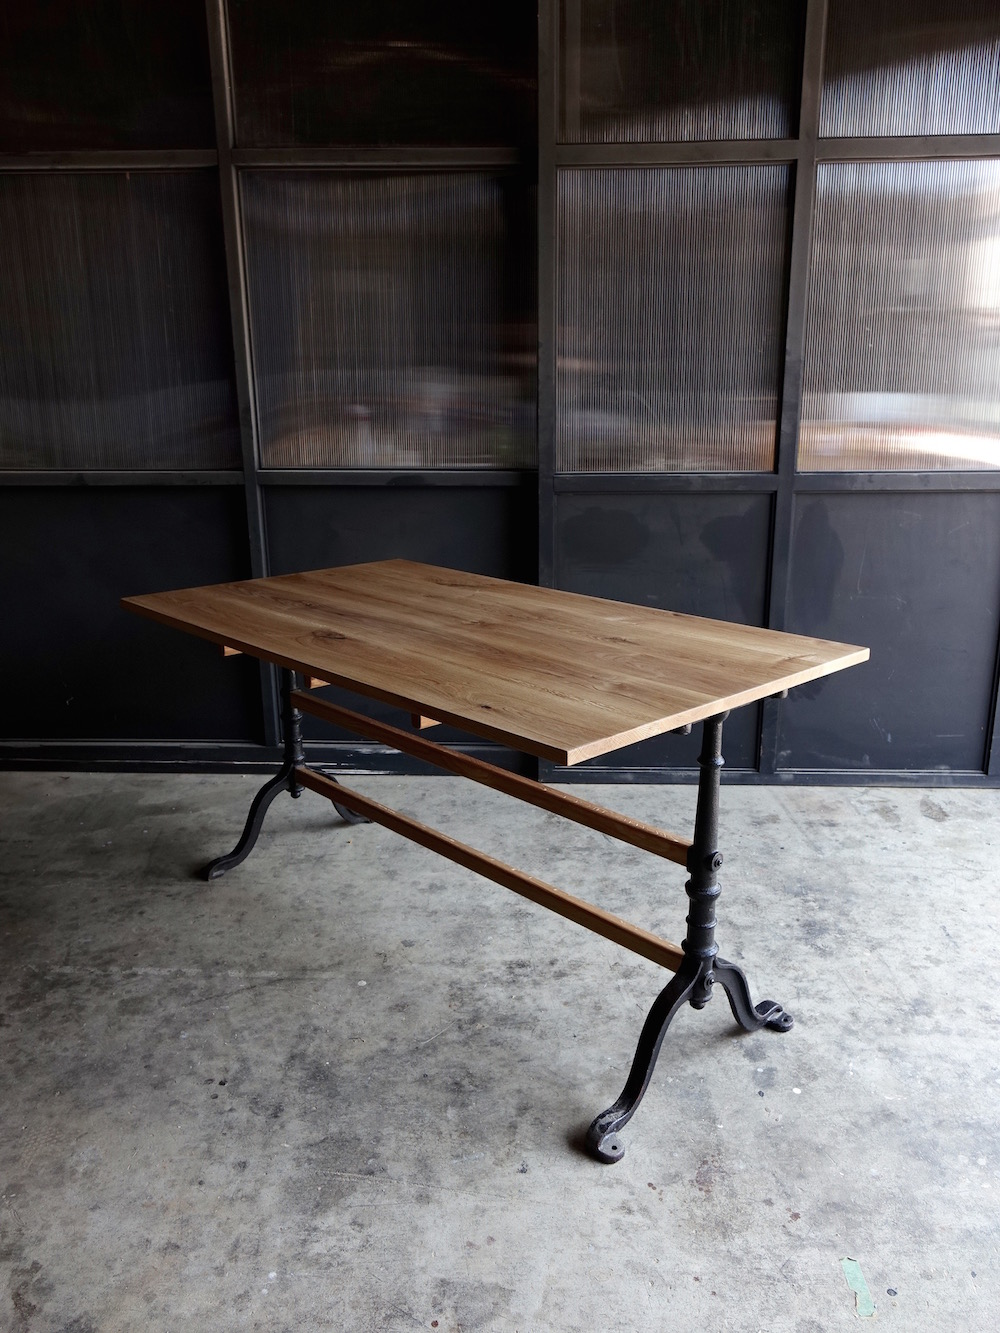 Antique metal leg table